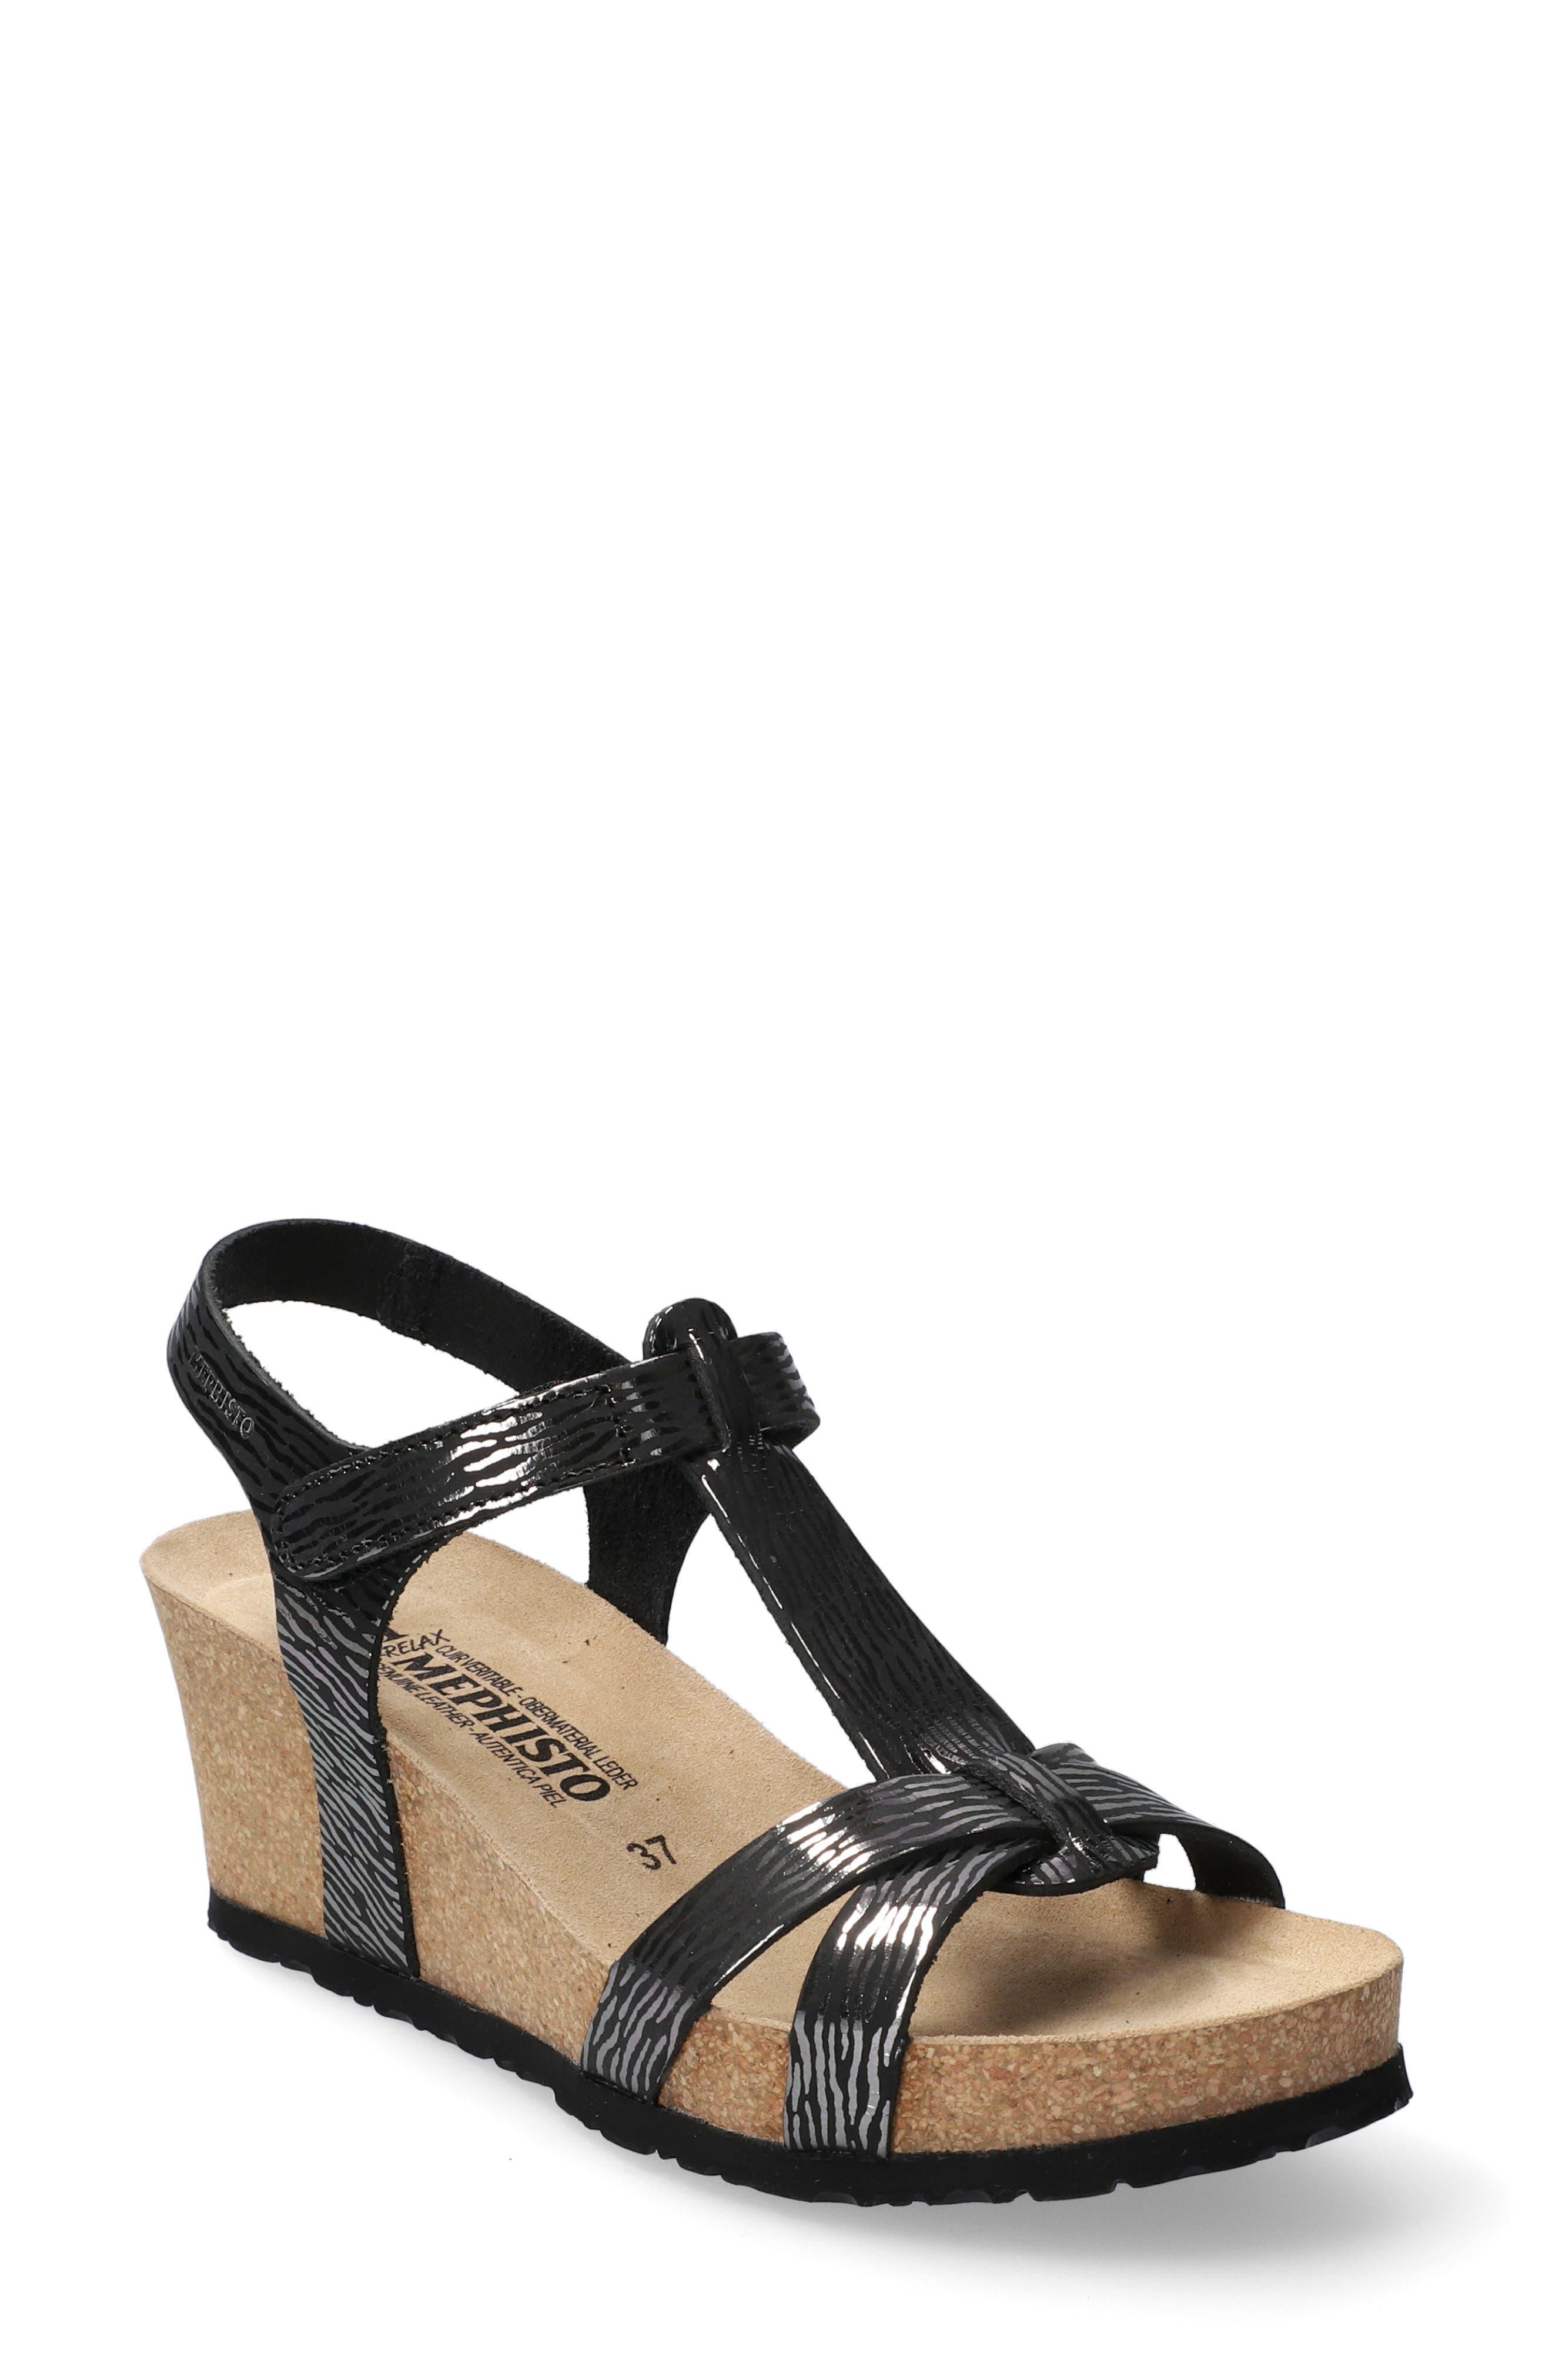 Liviane Wedge Sandal